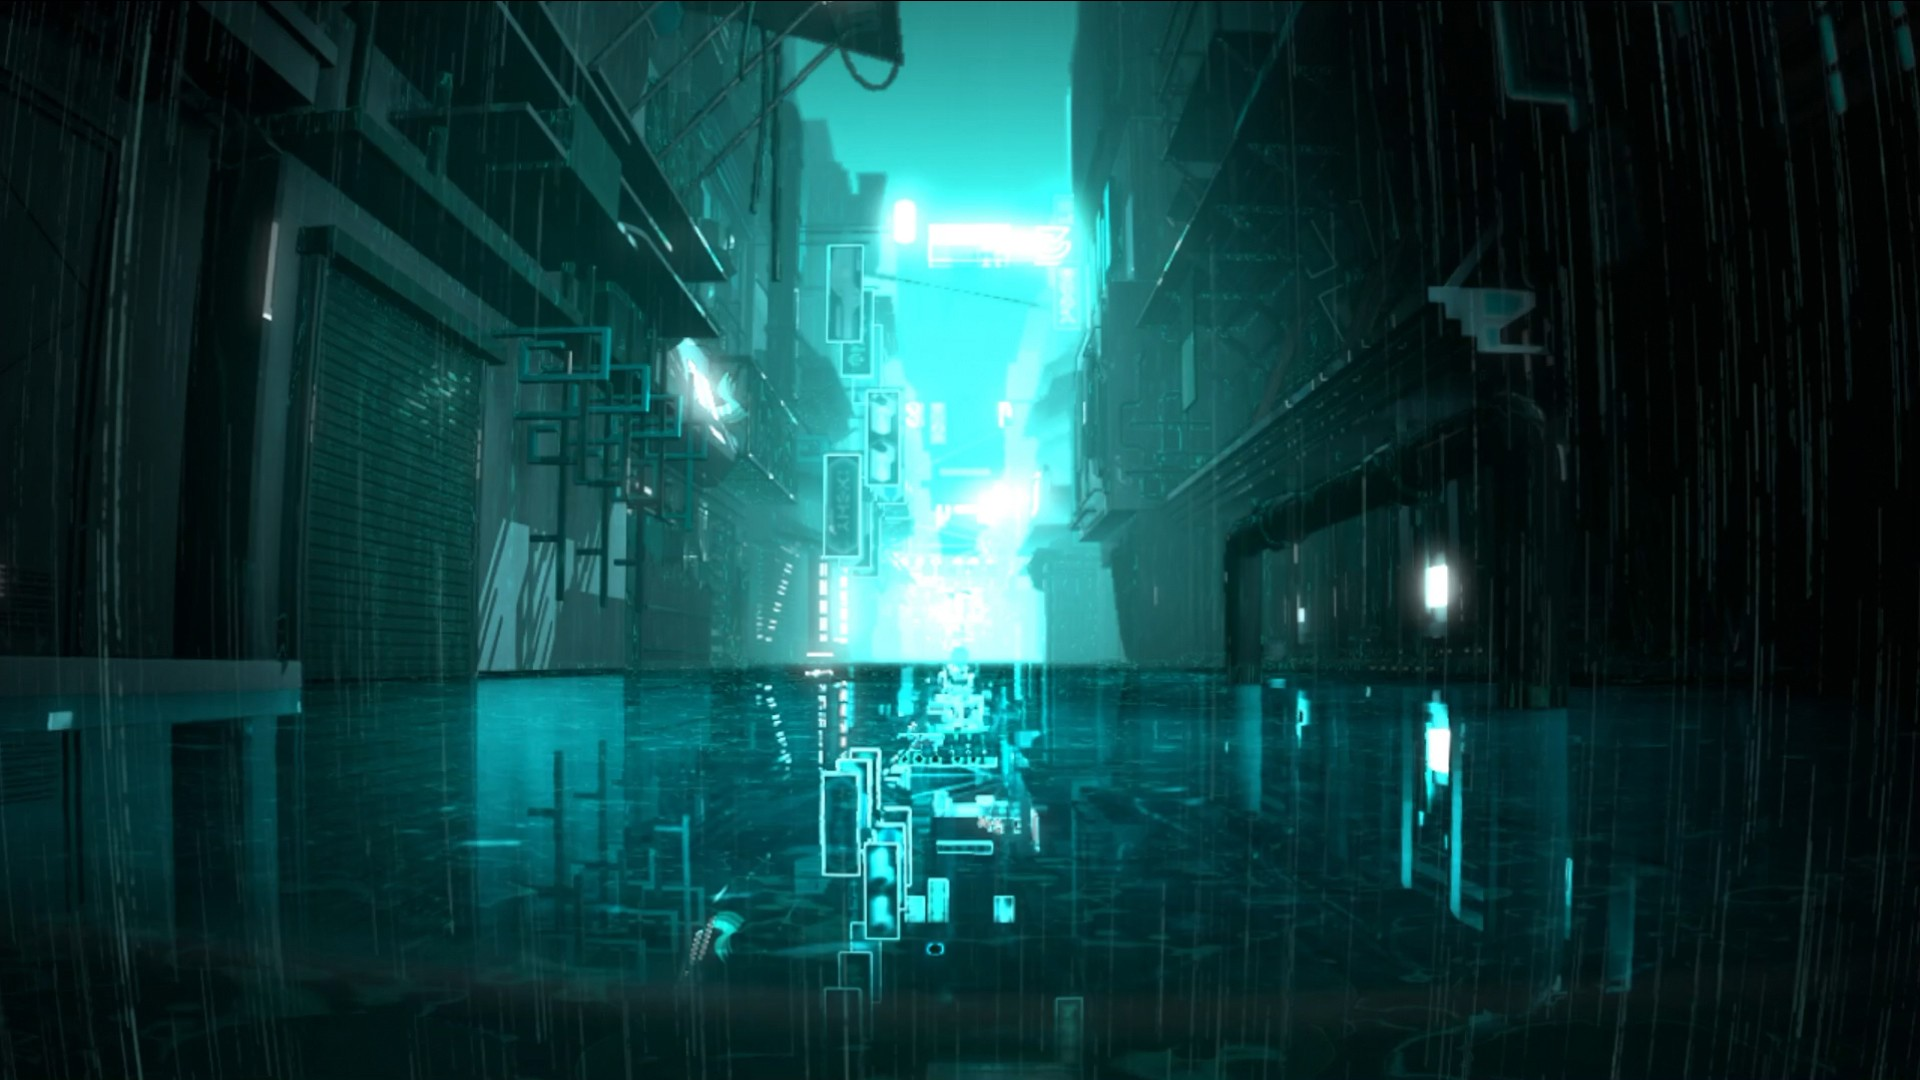 General 1920x1080 Tron movies cyan rain alleyway dark night wet street neon reflection